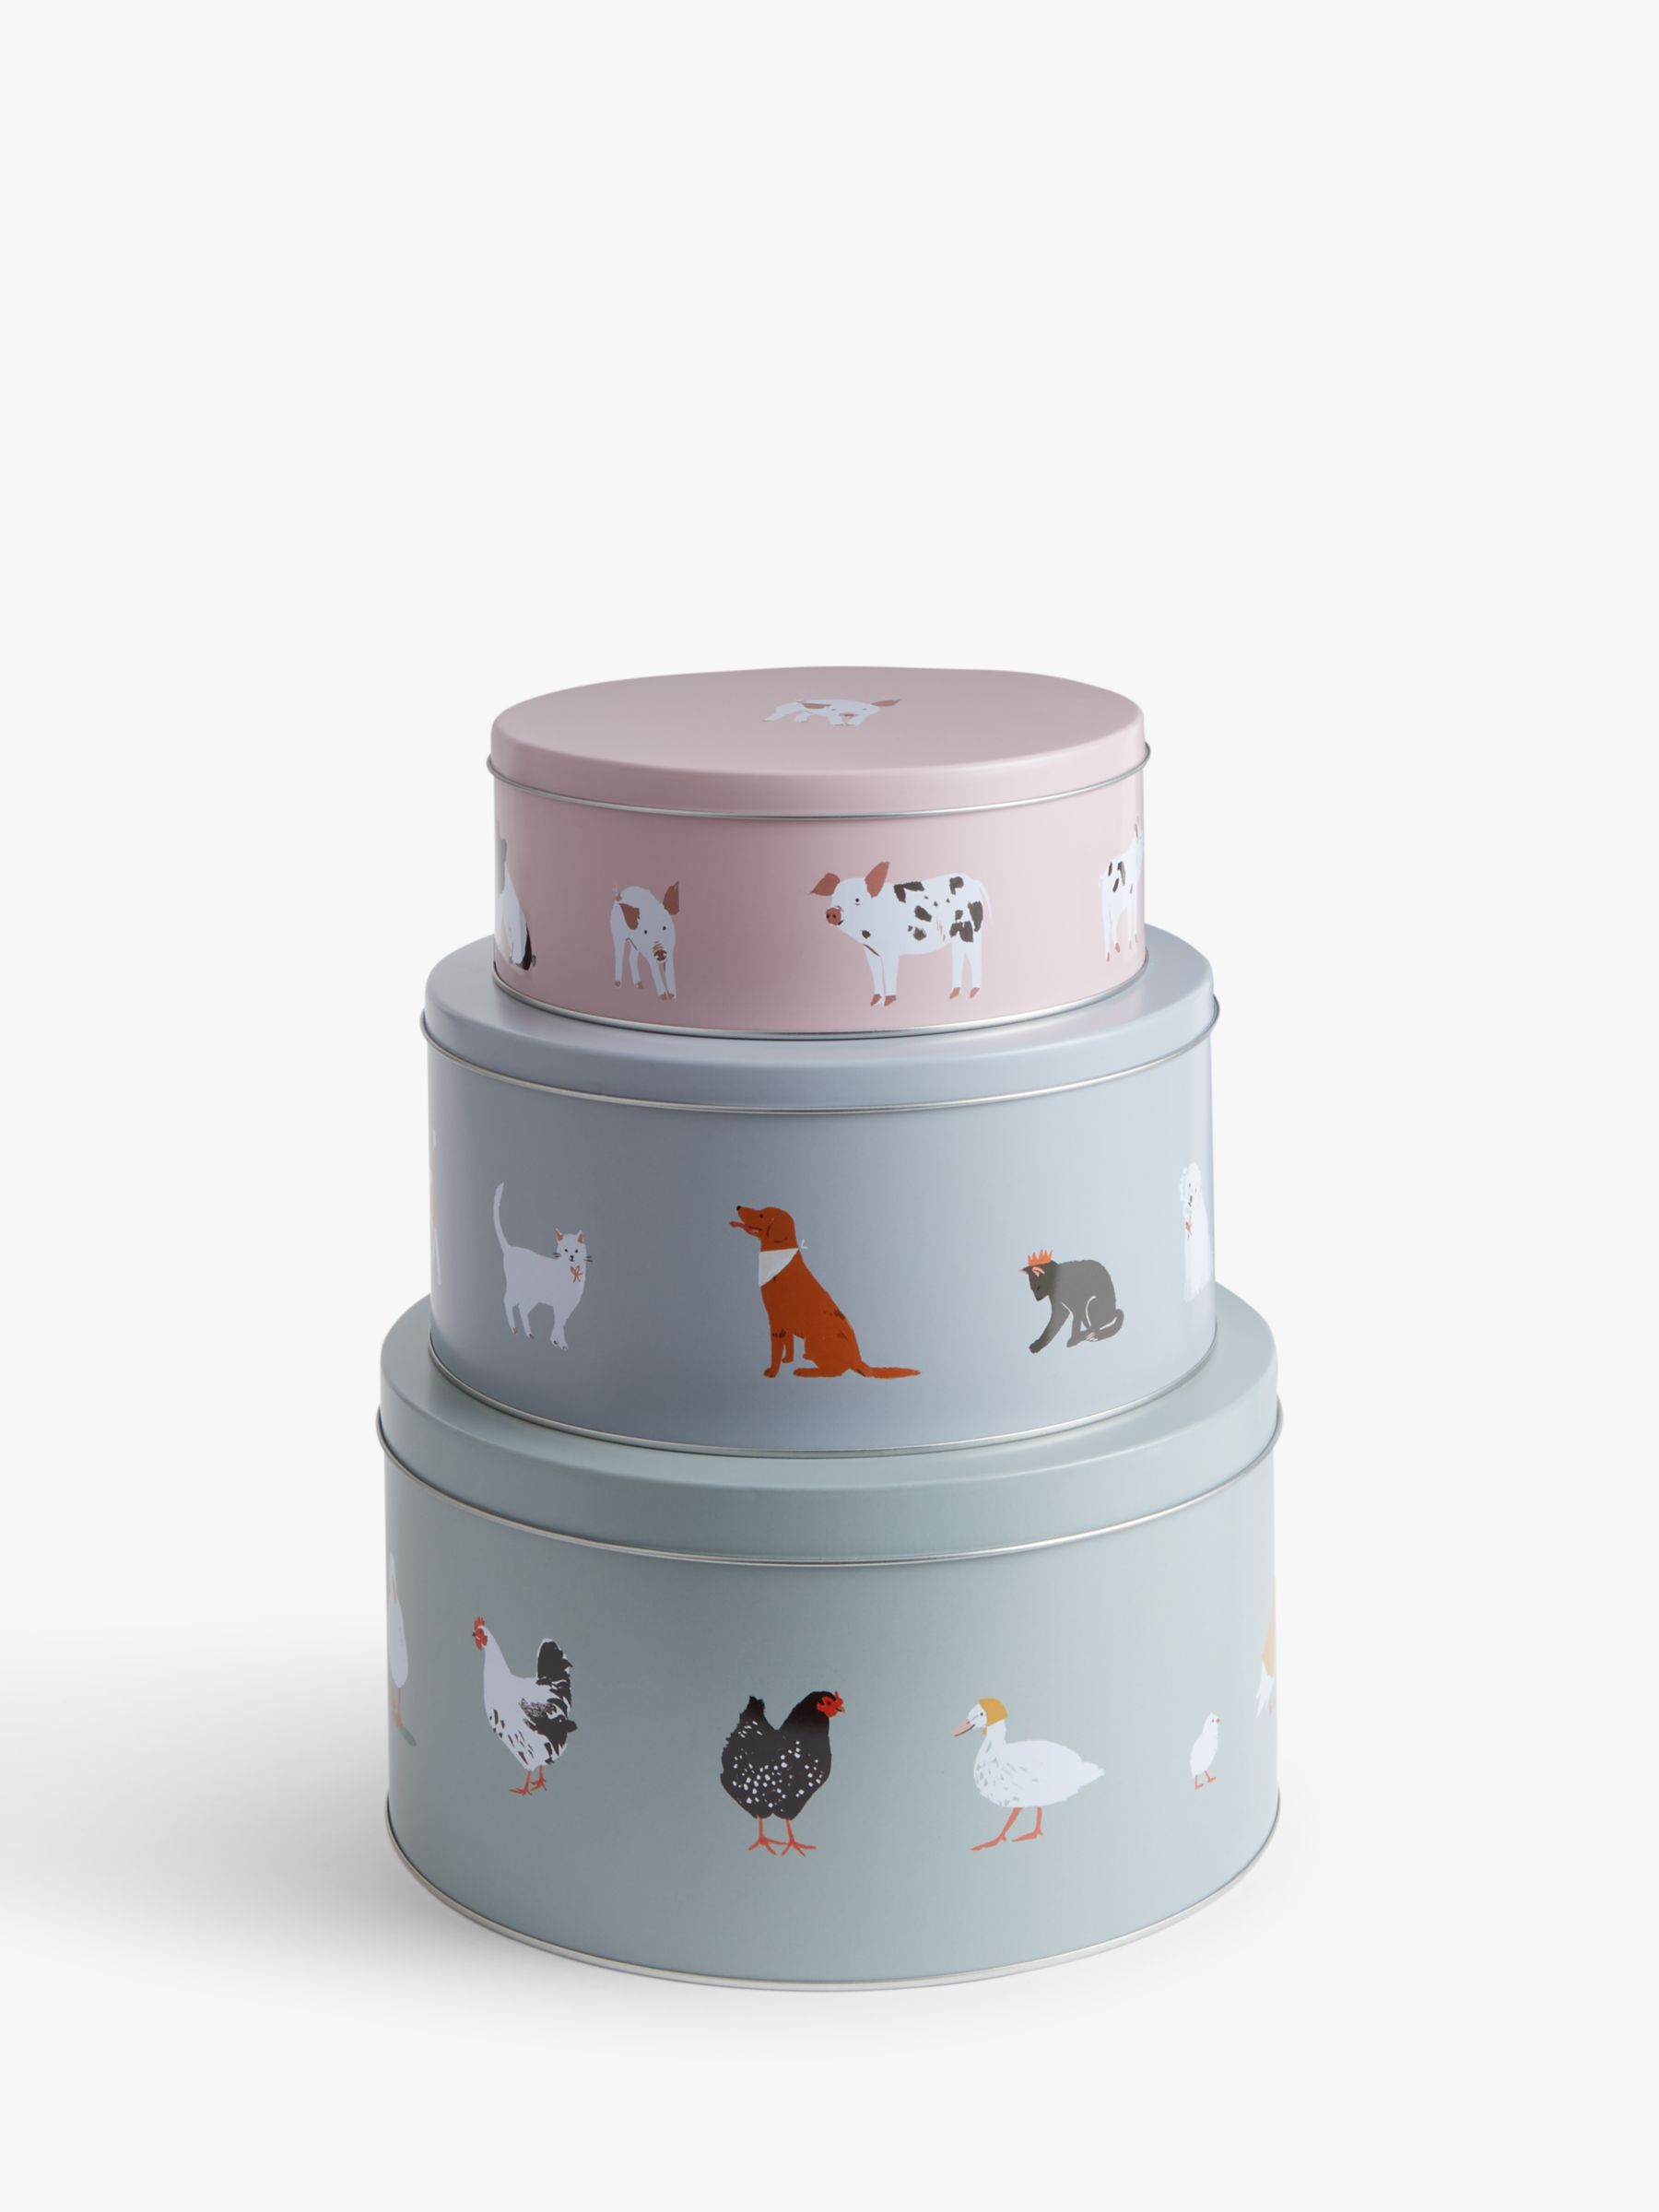 John Lewis & Partners Farm & Pet Animal Print Cake Tins, Set of 3, Multi